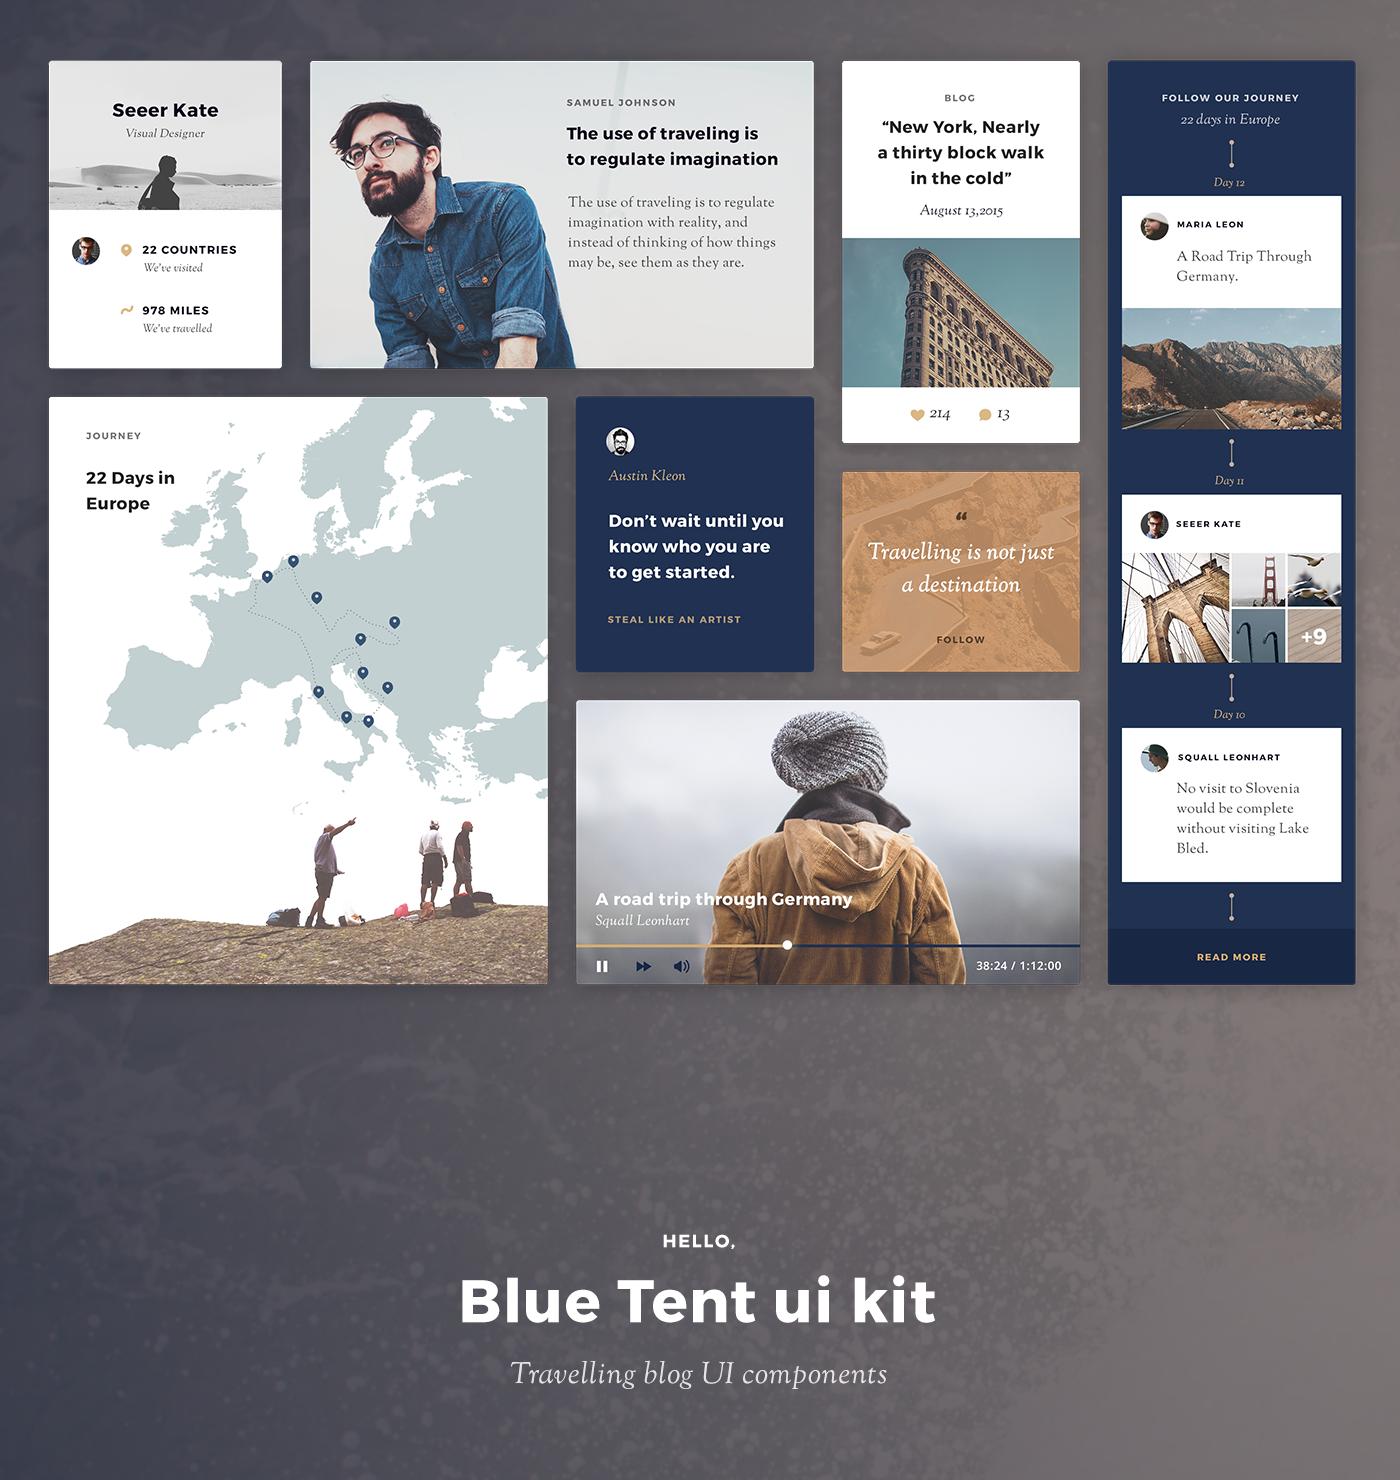 Blue Tent ui kit | Travel blog UI components on Behance